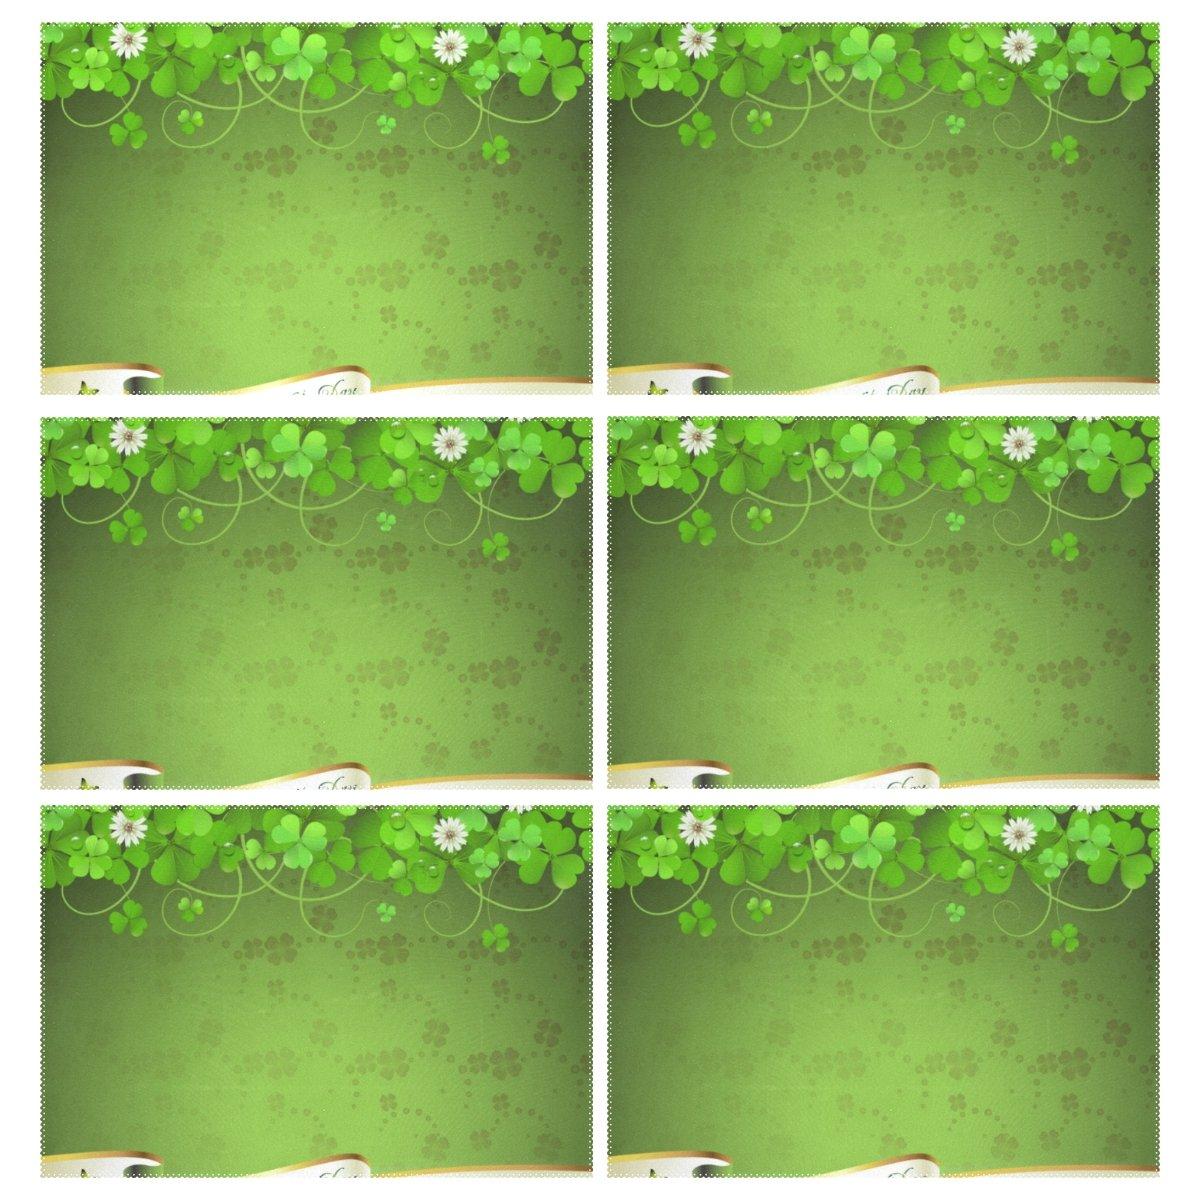 vantasoキッチンテーブルPlacemats Set of 6聖パトリックの日グリーンクローバーと花洗濯可能ダイニングテーブルマット耐熱性Placeマットfor Kids長方形テーブル12 x 18インチ   B078Y4MWM9